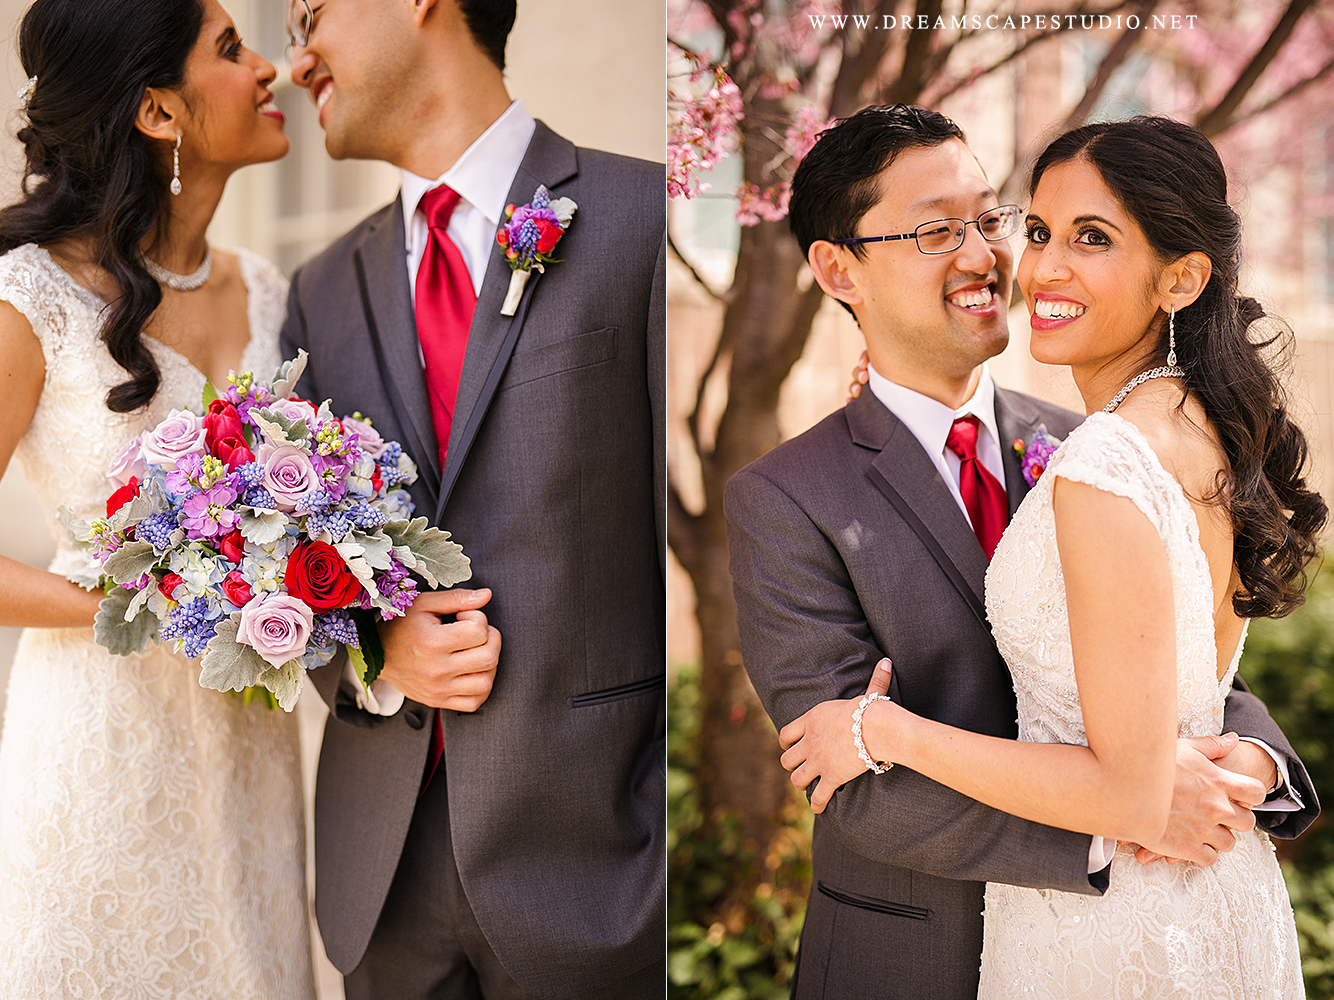 CT_Wedding_Photographer_PaHe_Blog_07.jpg